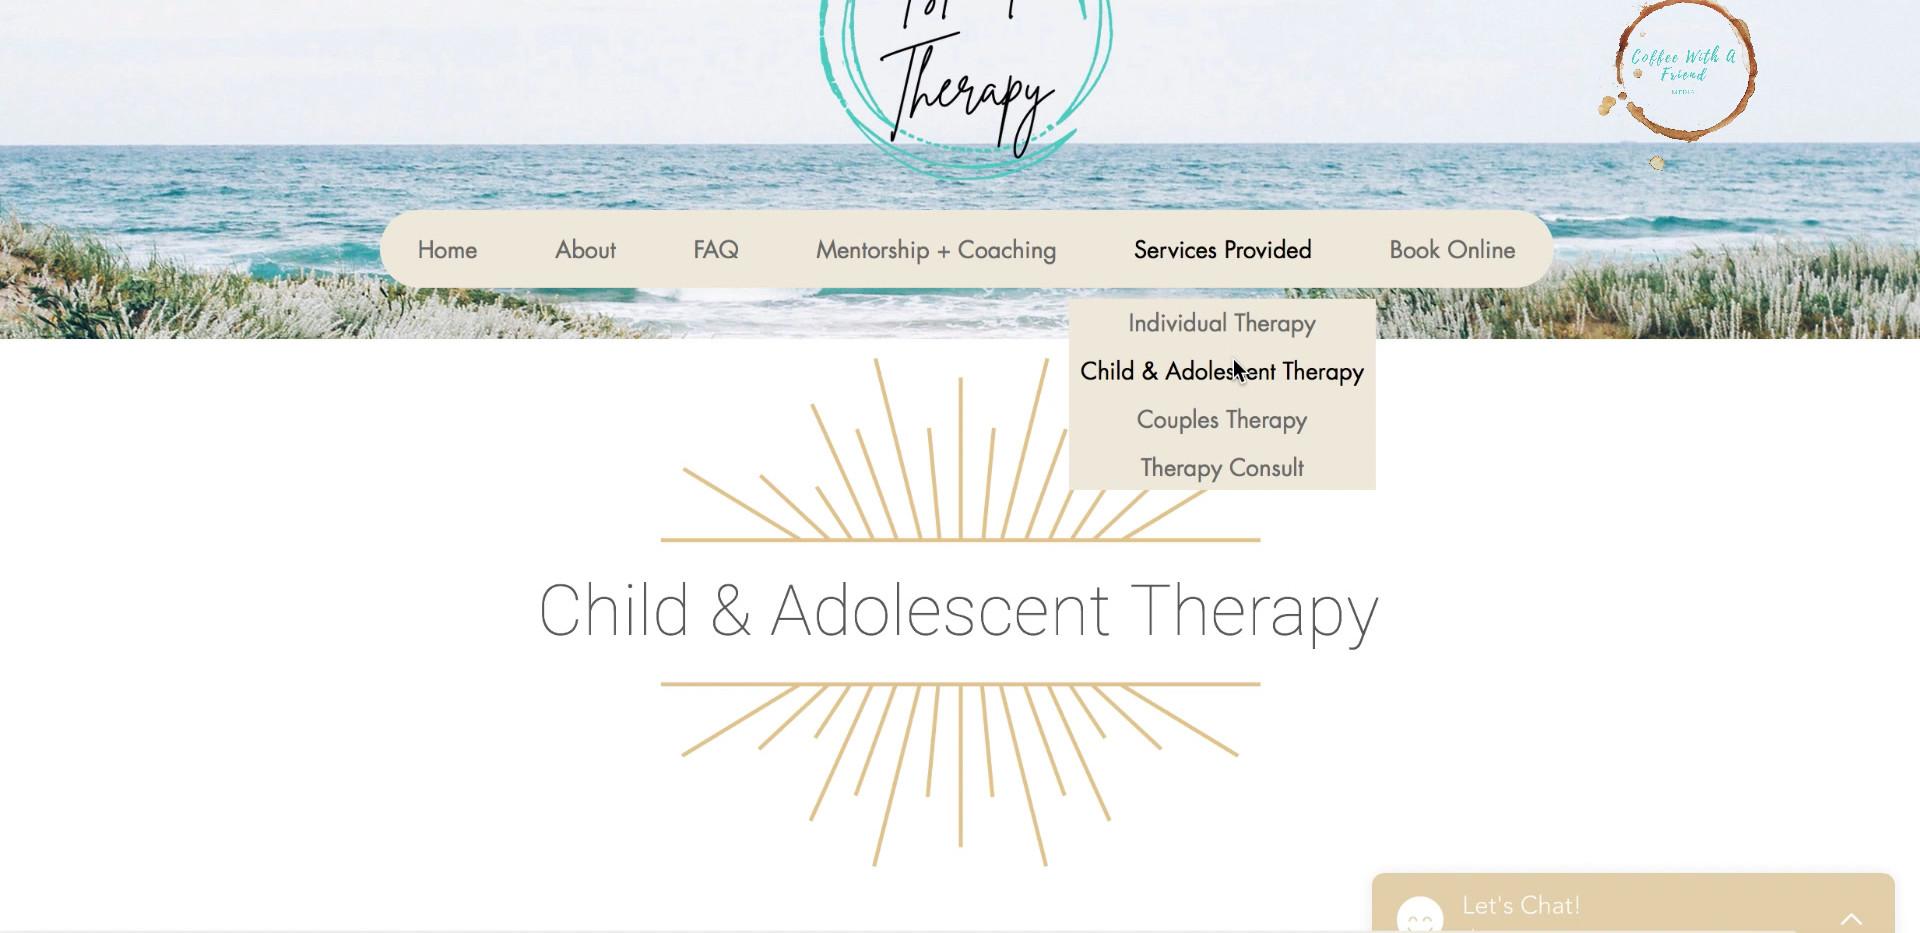 Island Therapy Look Book Promo.mp4